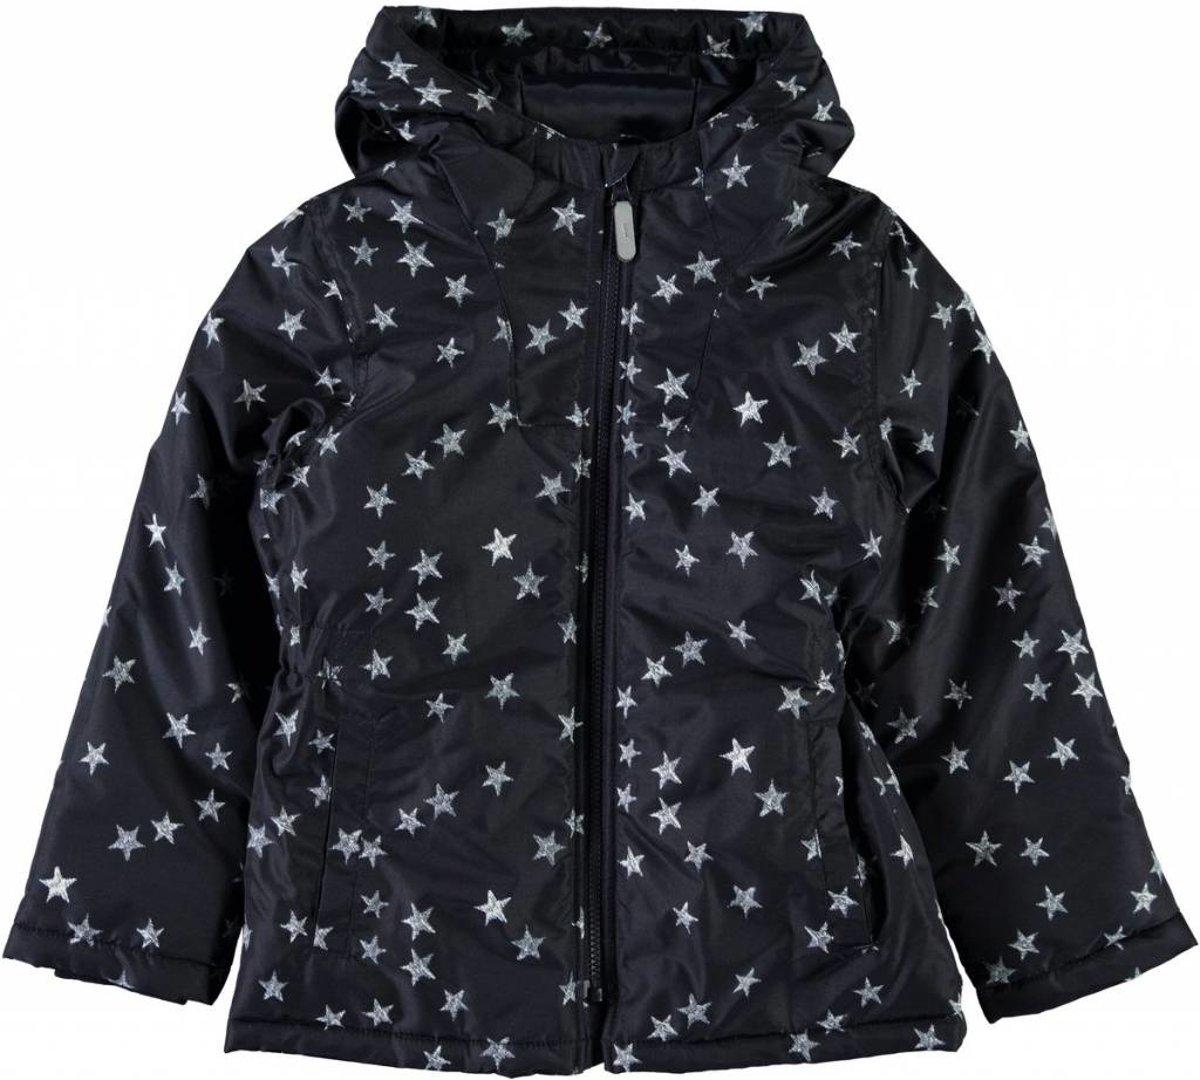 Name-it meisjes winterjas MING Sky captain - 158